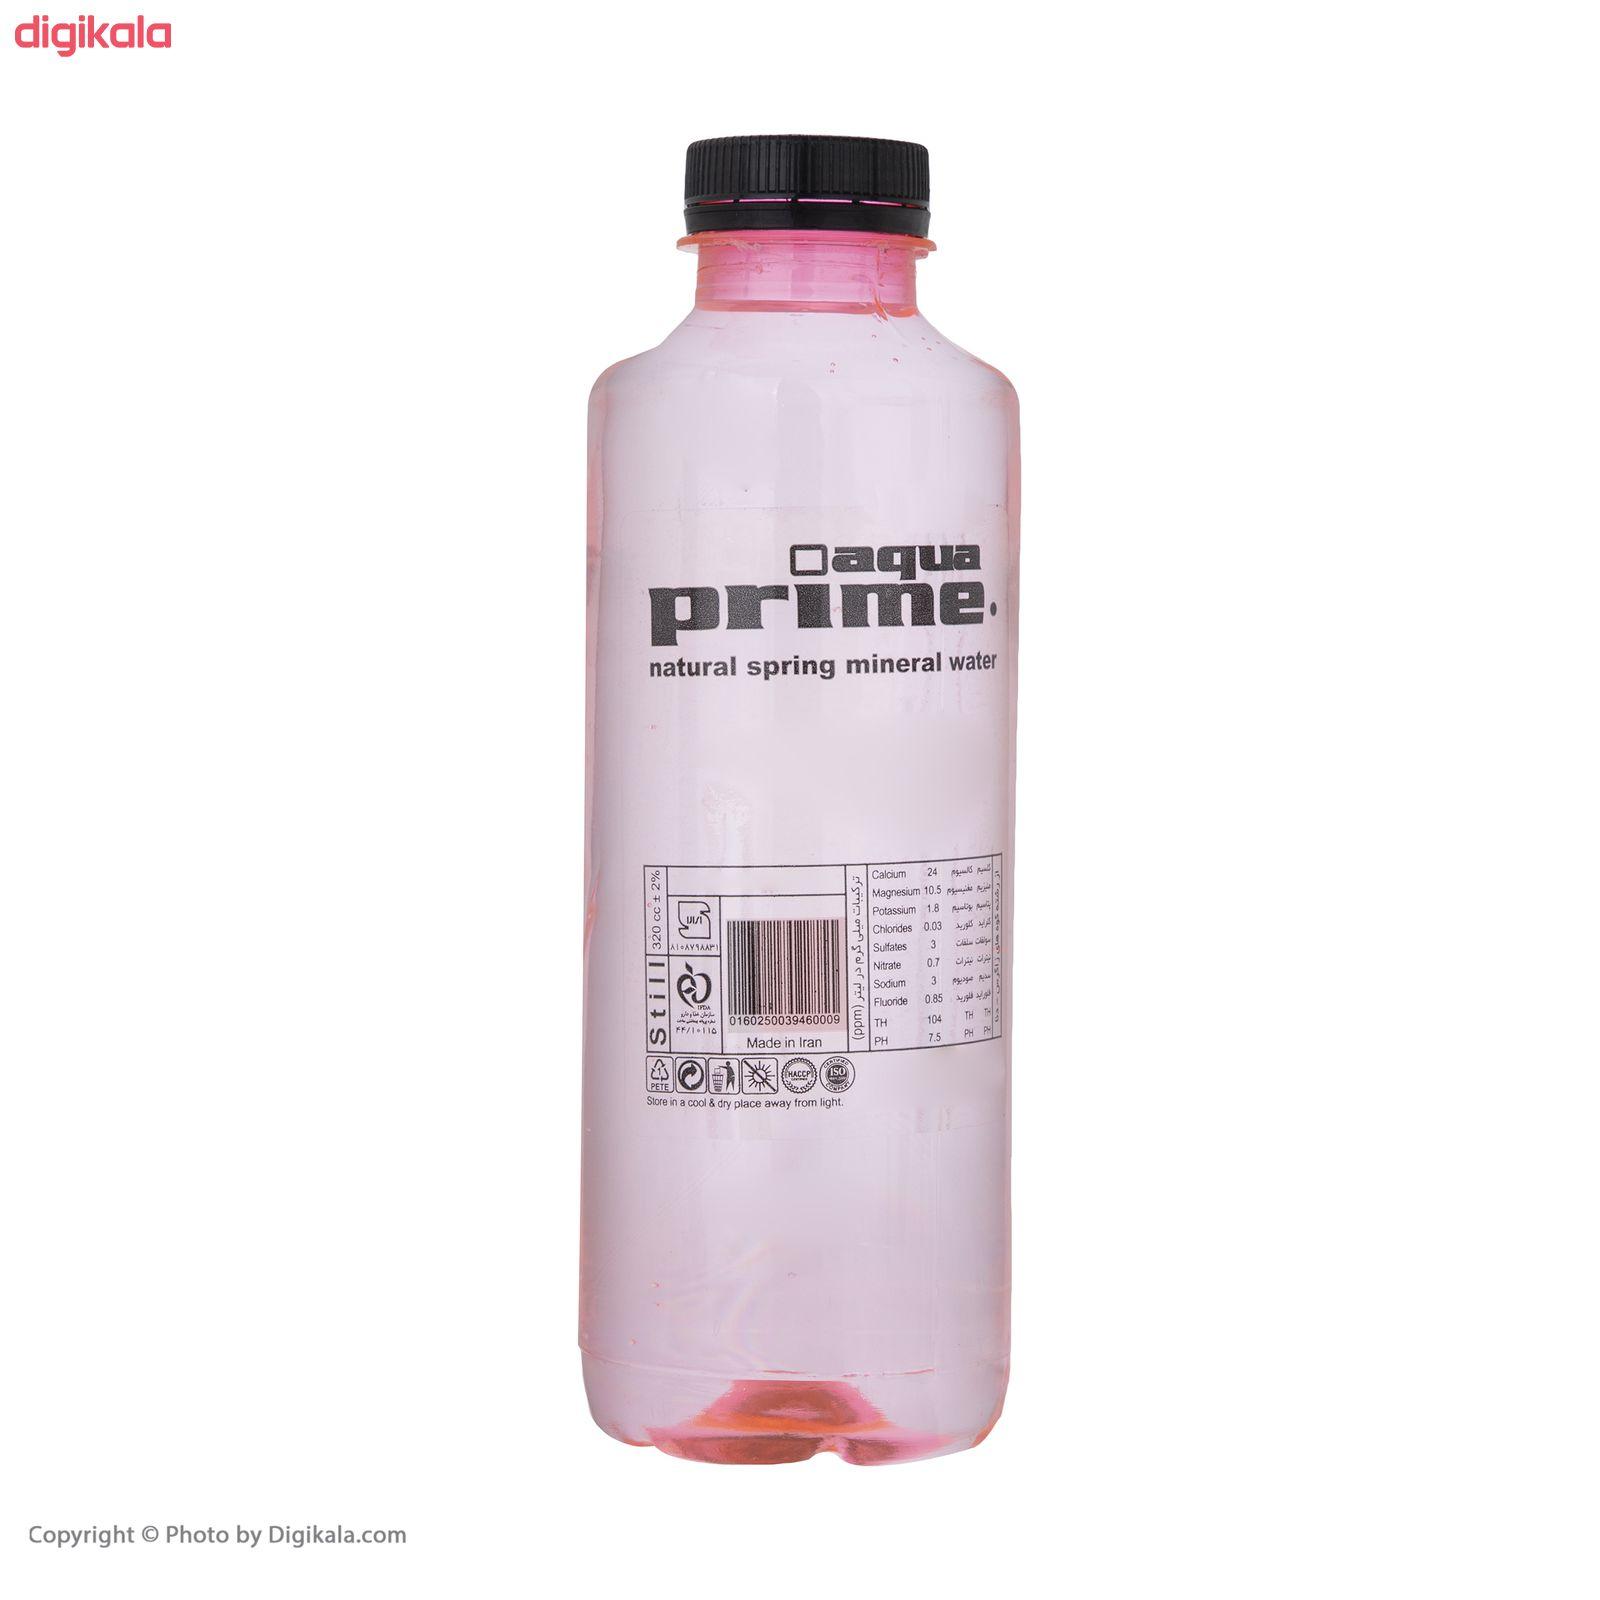 آب معدنی آکوا پرایم ویژه -300 میلی لیتر بسته 12 عددی main 1 8